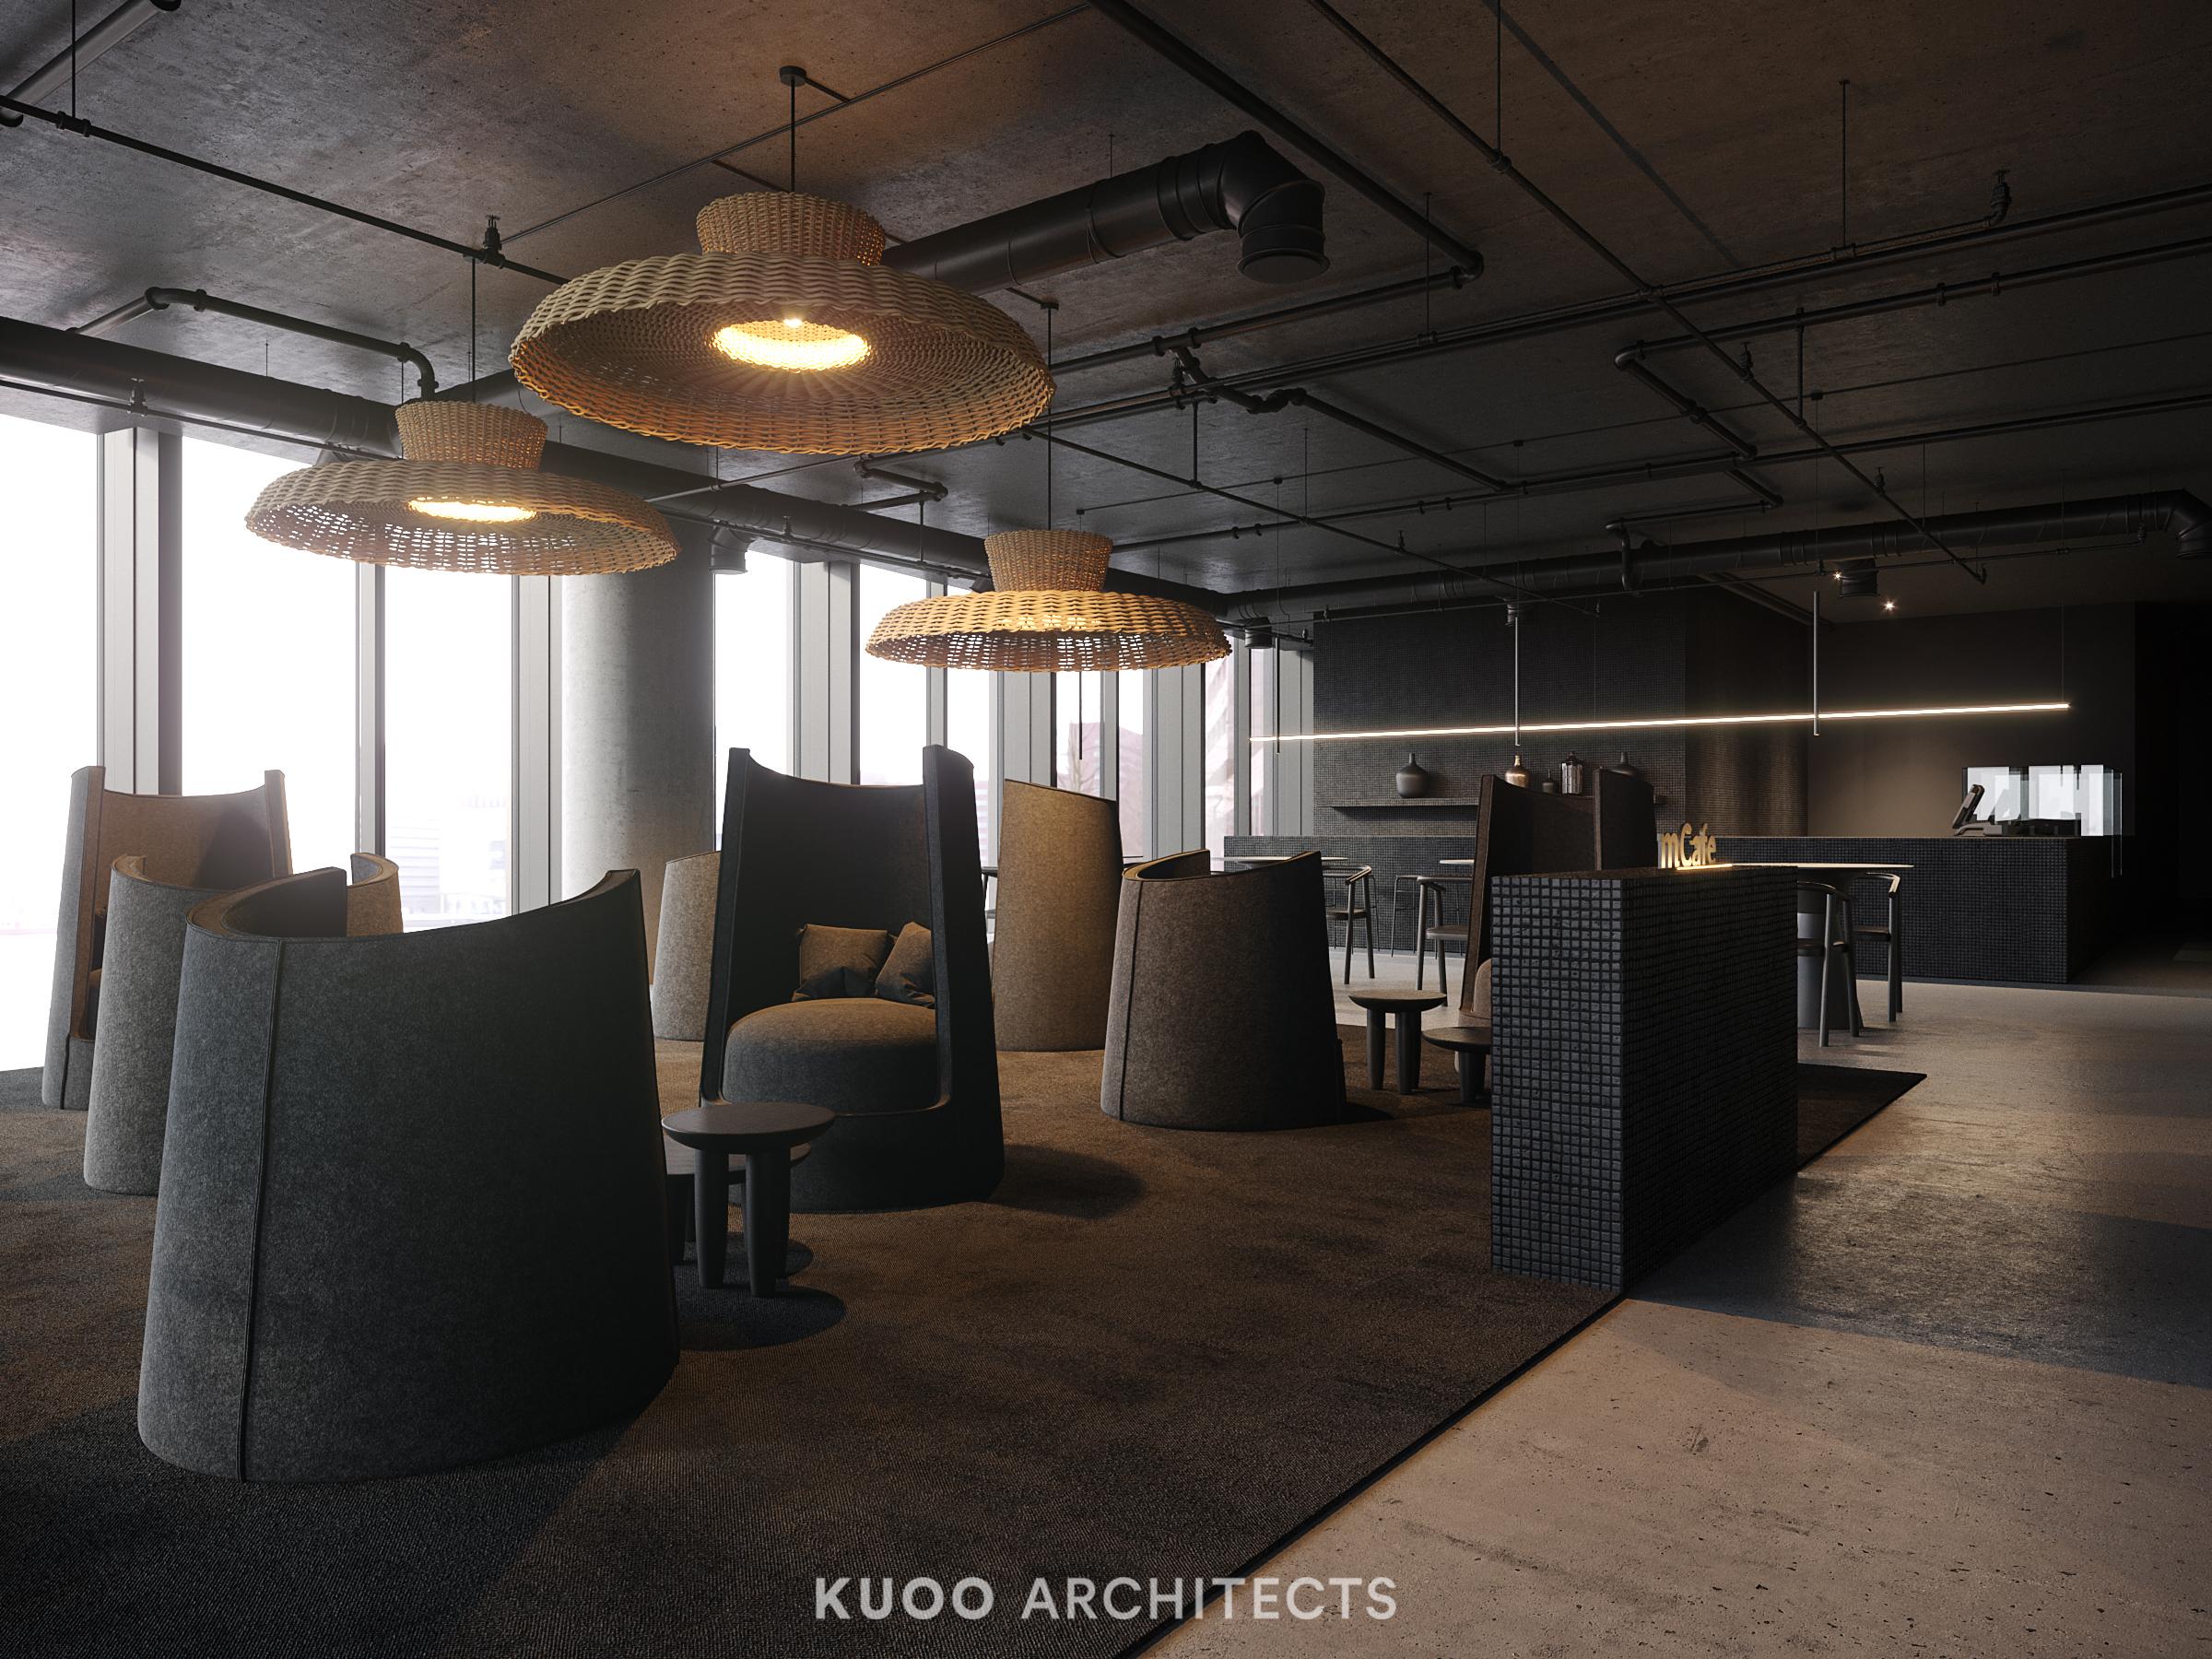 kuoo_architects_mcafe_2